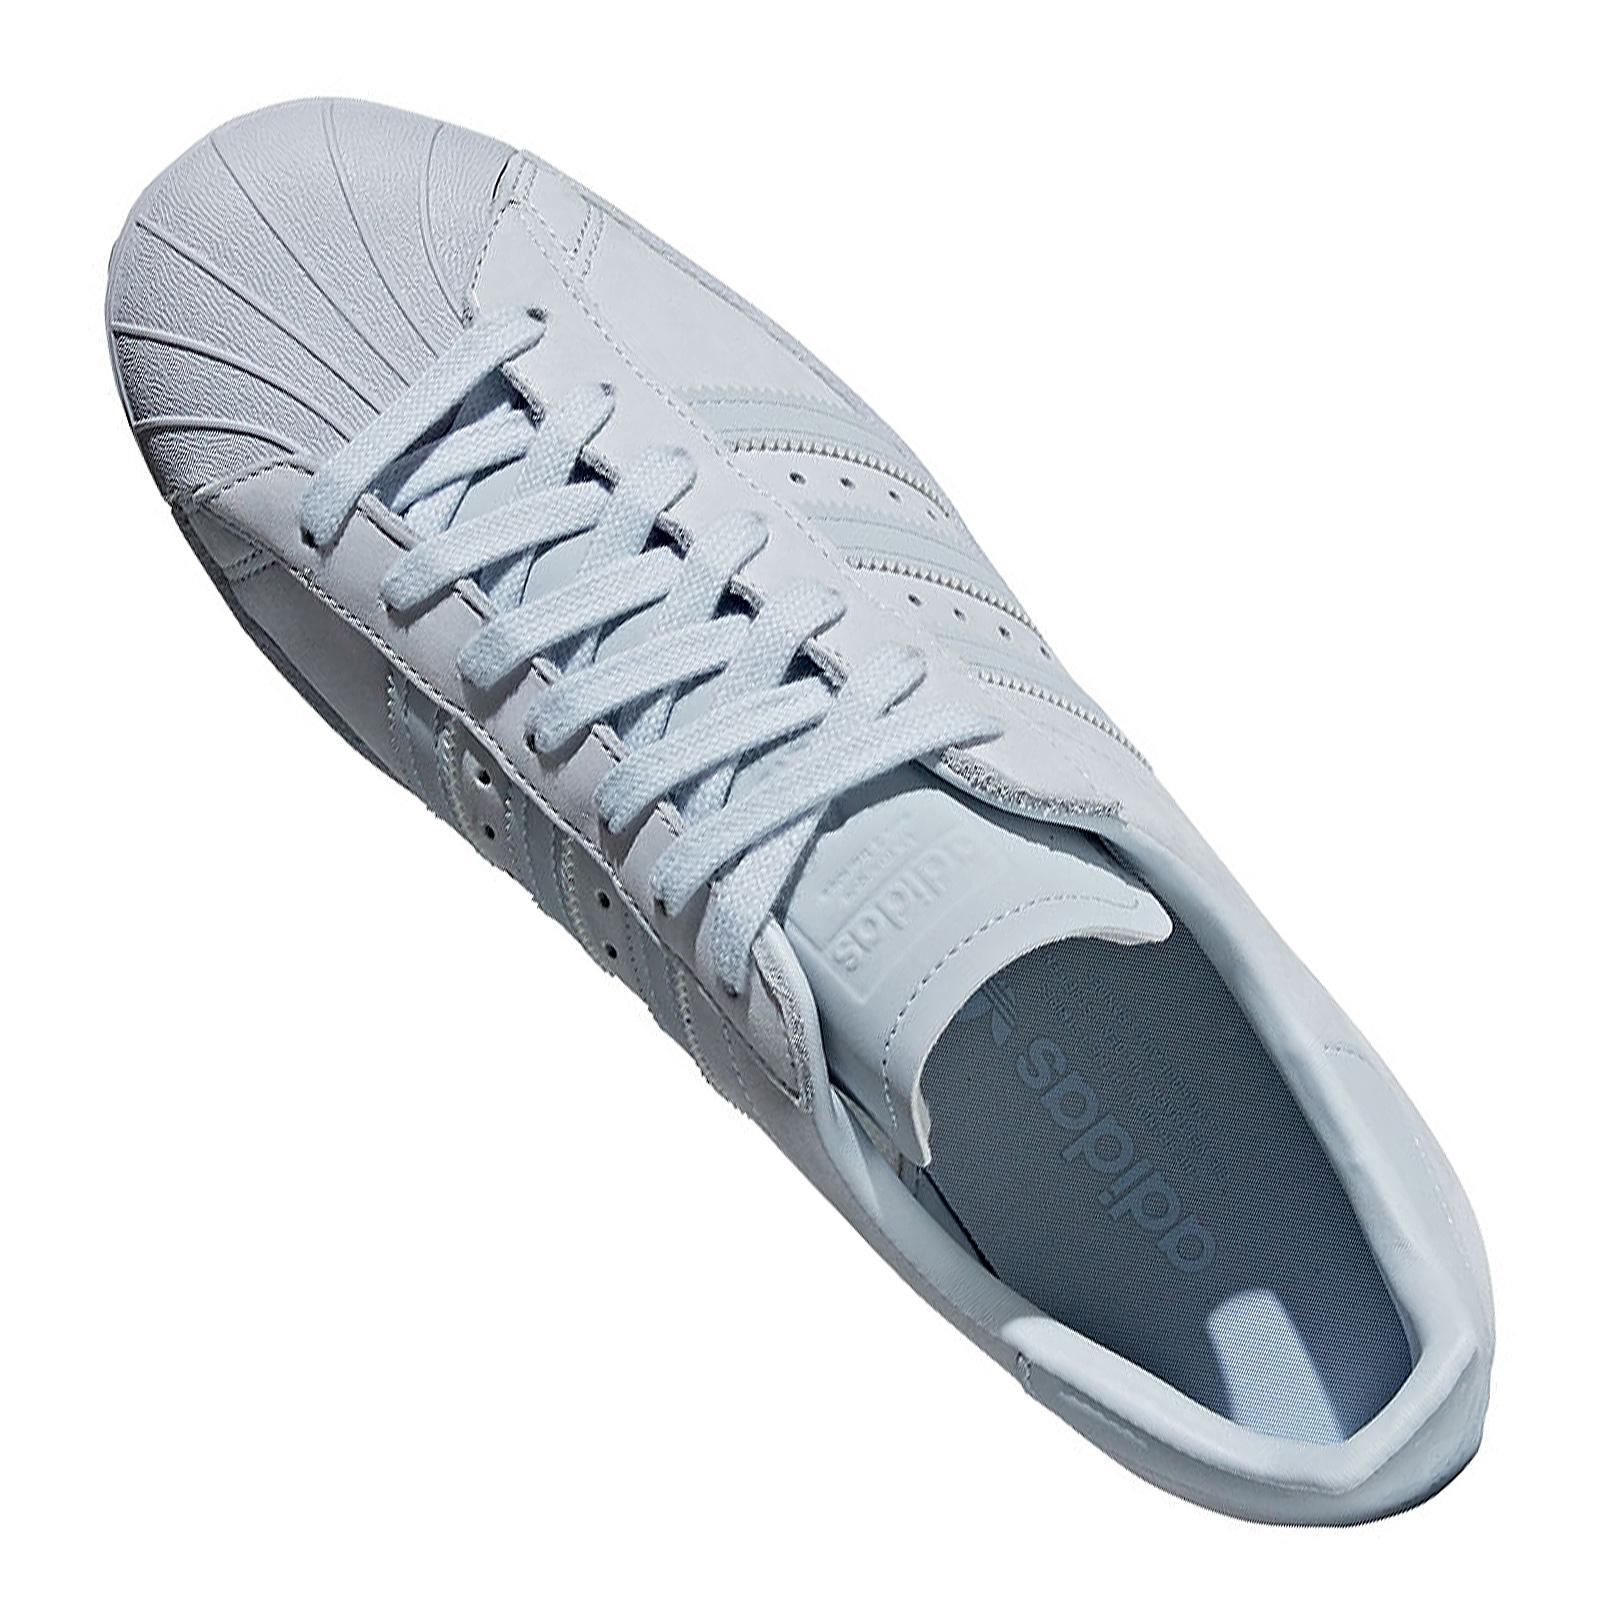 uk availability 09368 4aa24 adidas Originals Superstar 80s Sneaker Turnschuhe CQ2659 Aeroblue Hellblau